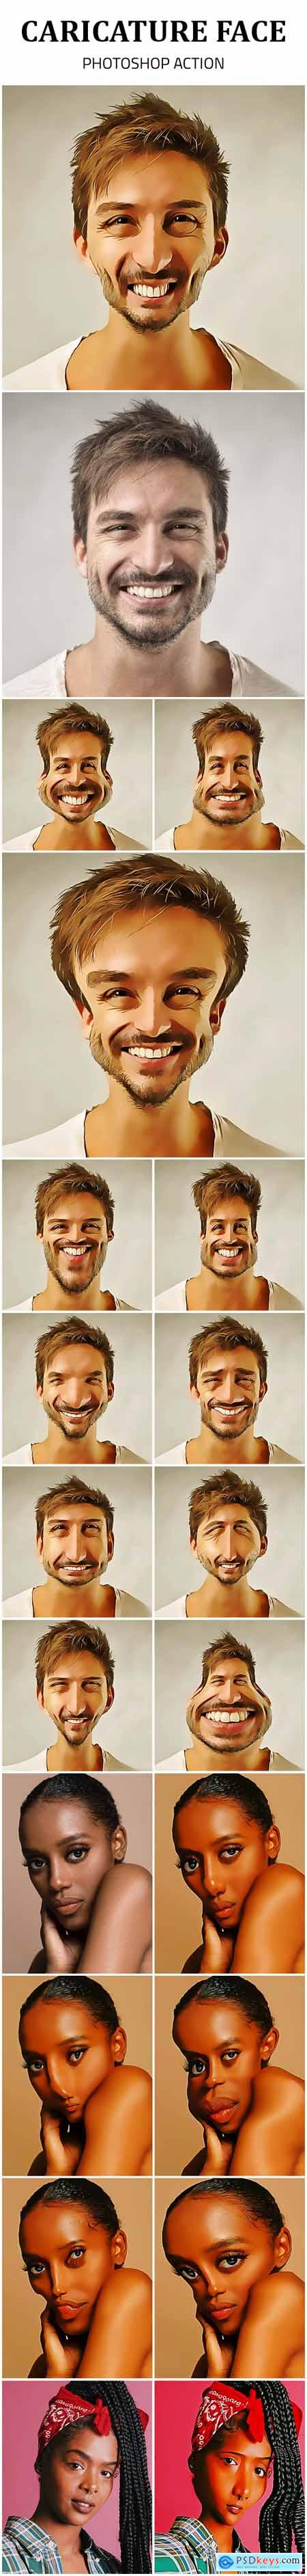 Caricature Face Photoshop Action 25590885